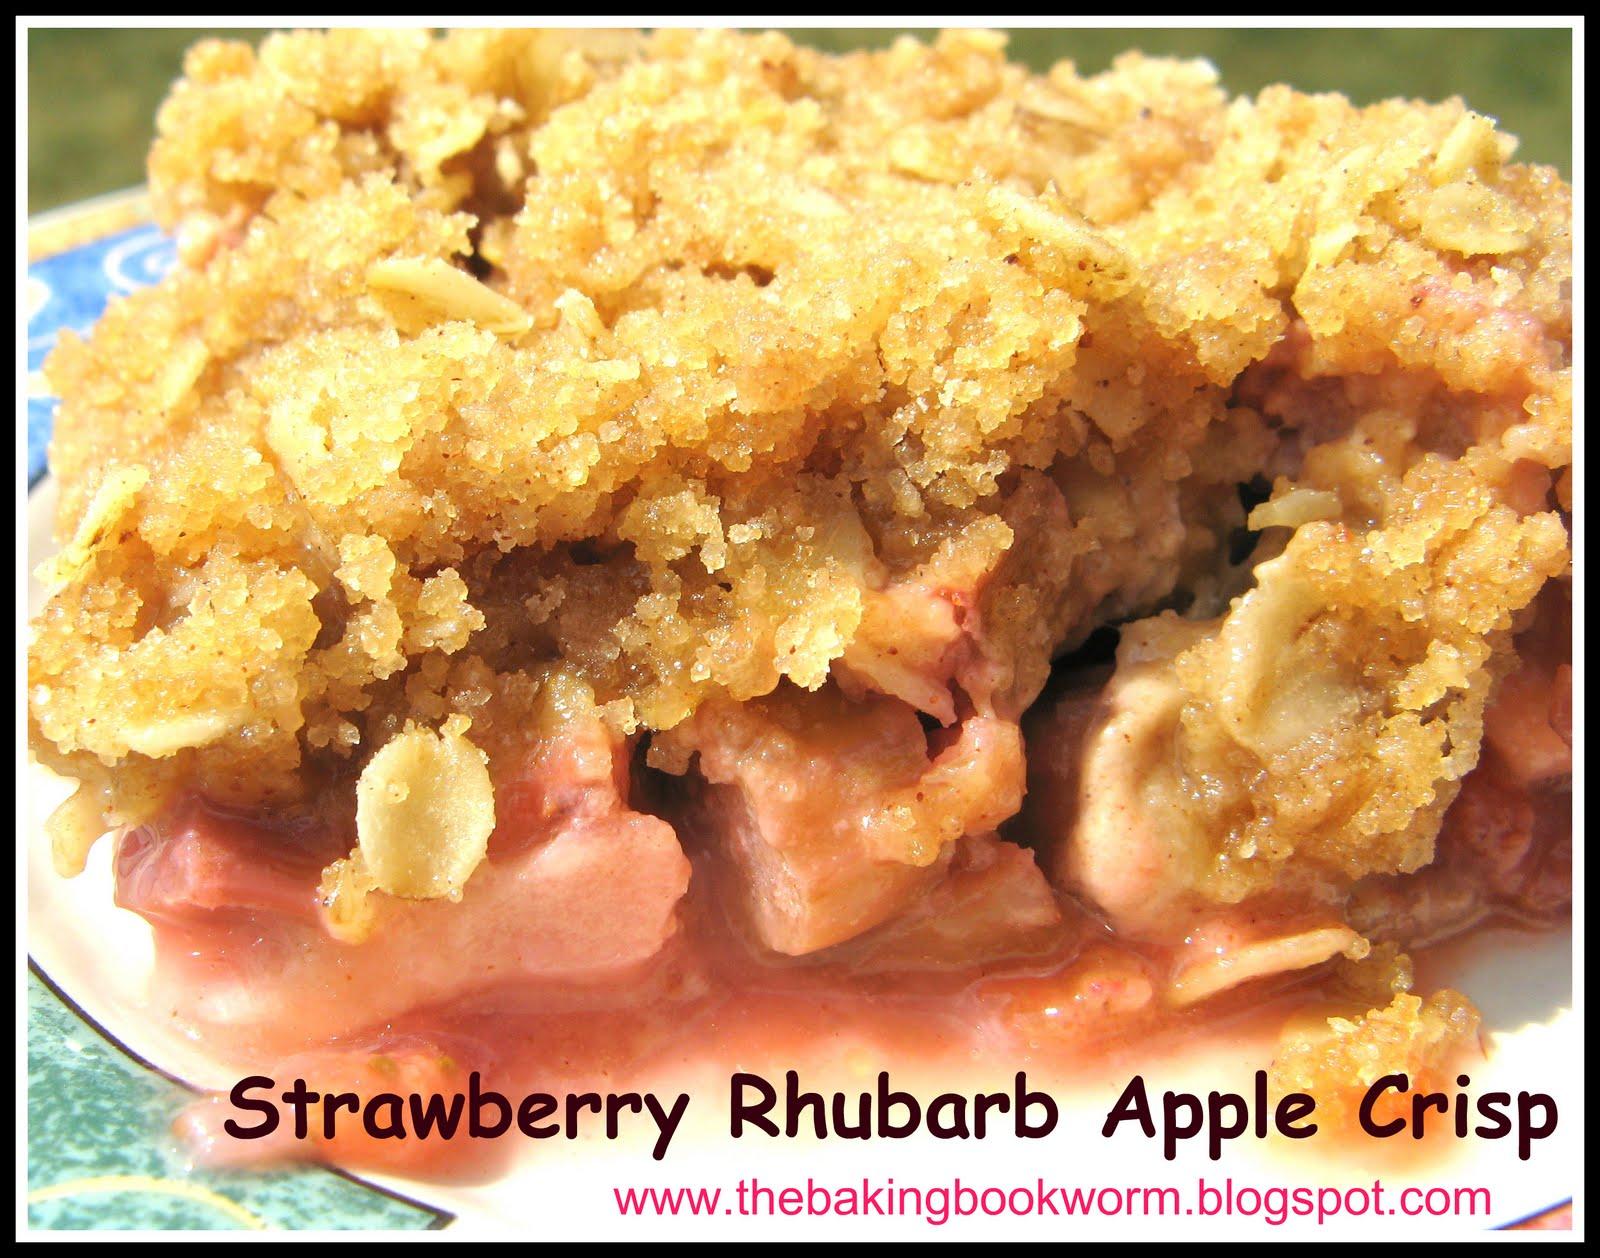 The Baking Bookworm: Strawberry Rhubarb Apple Crisp